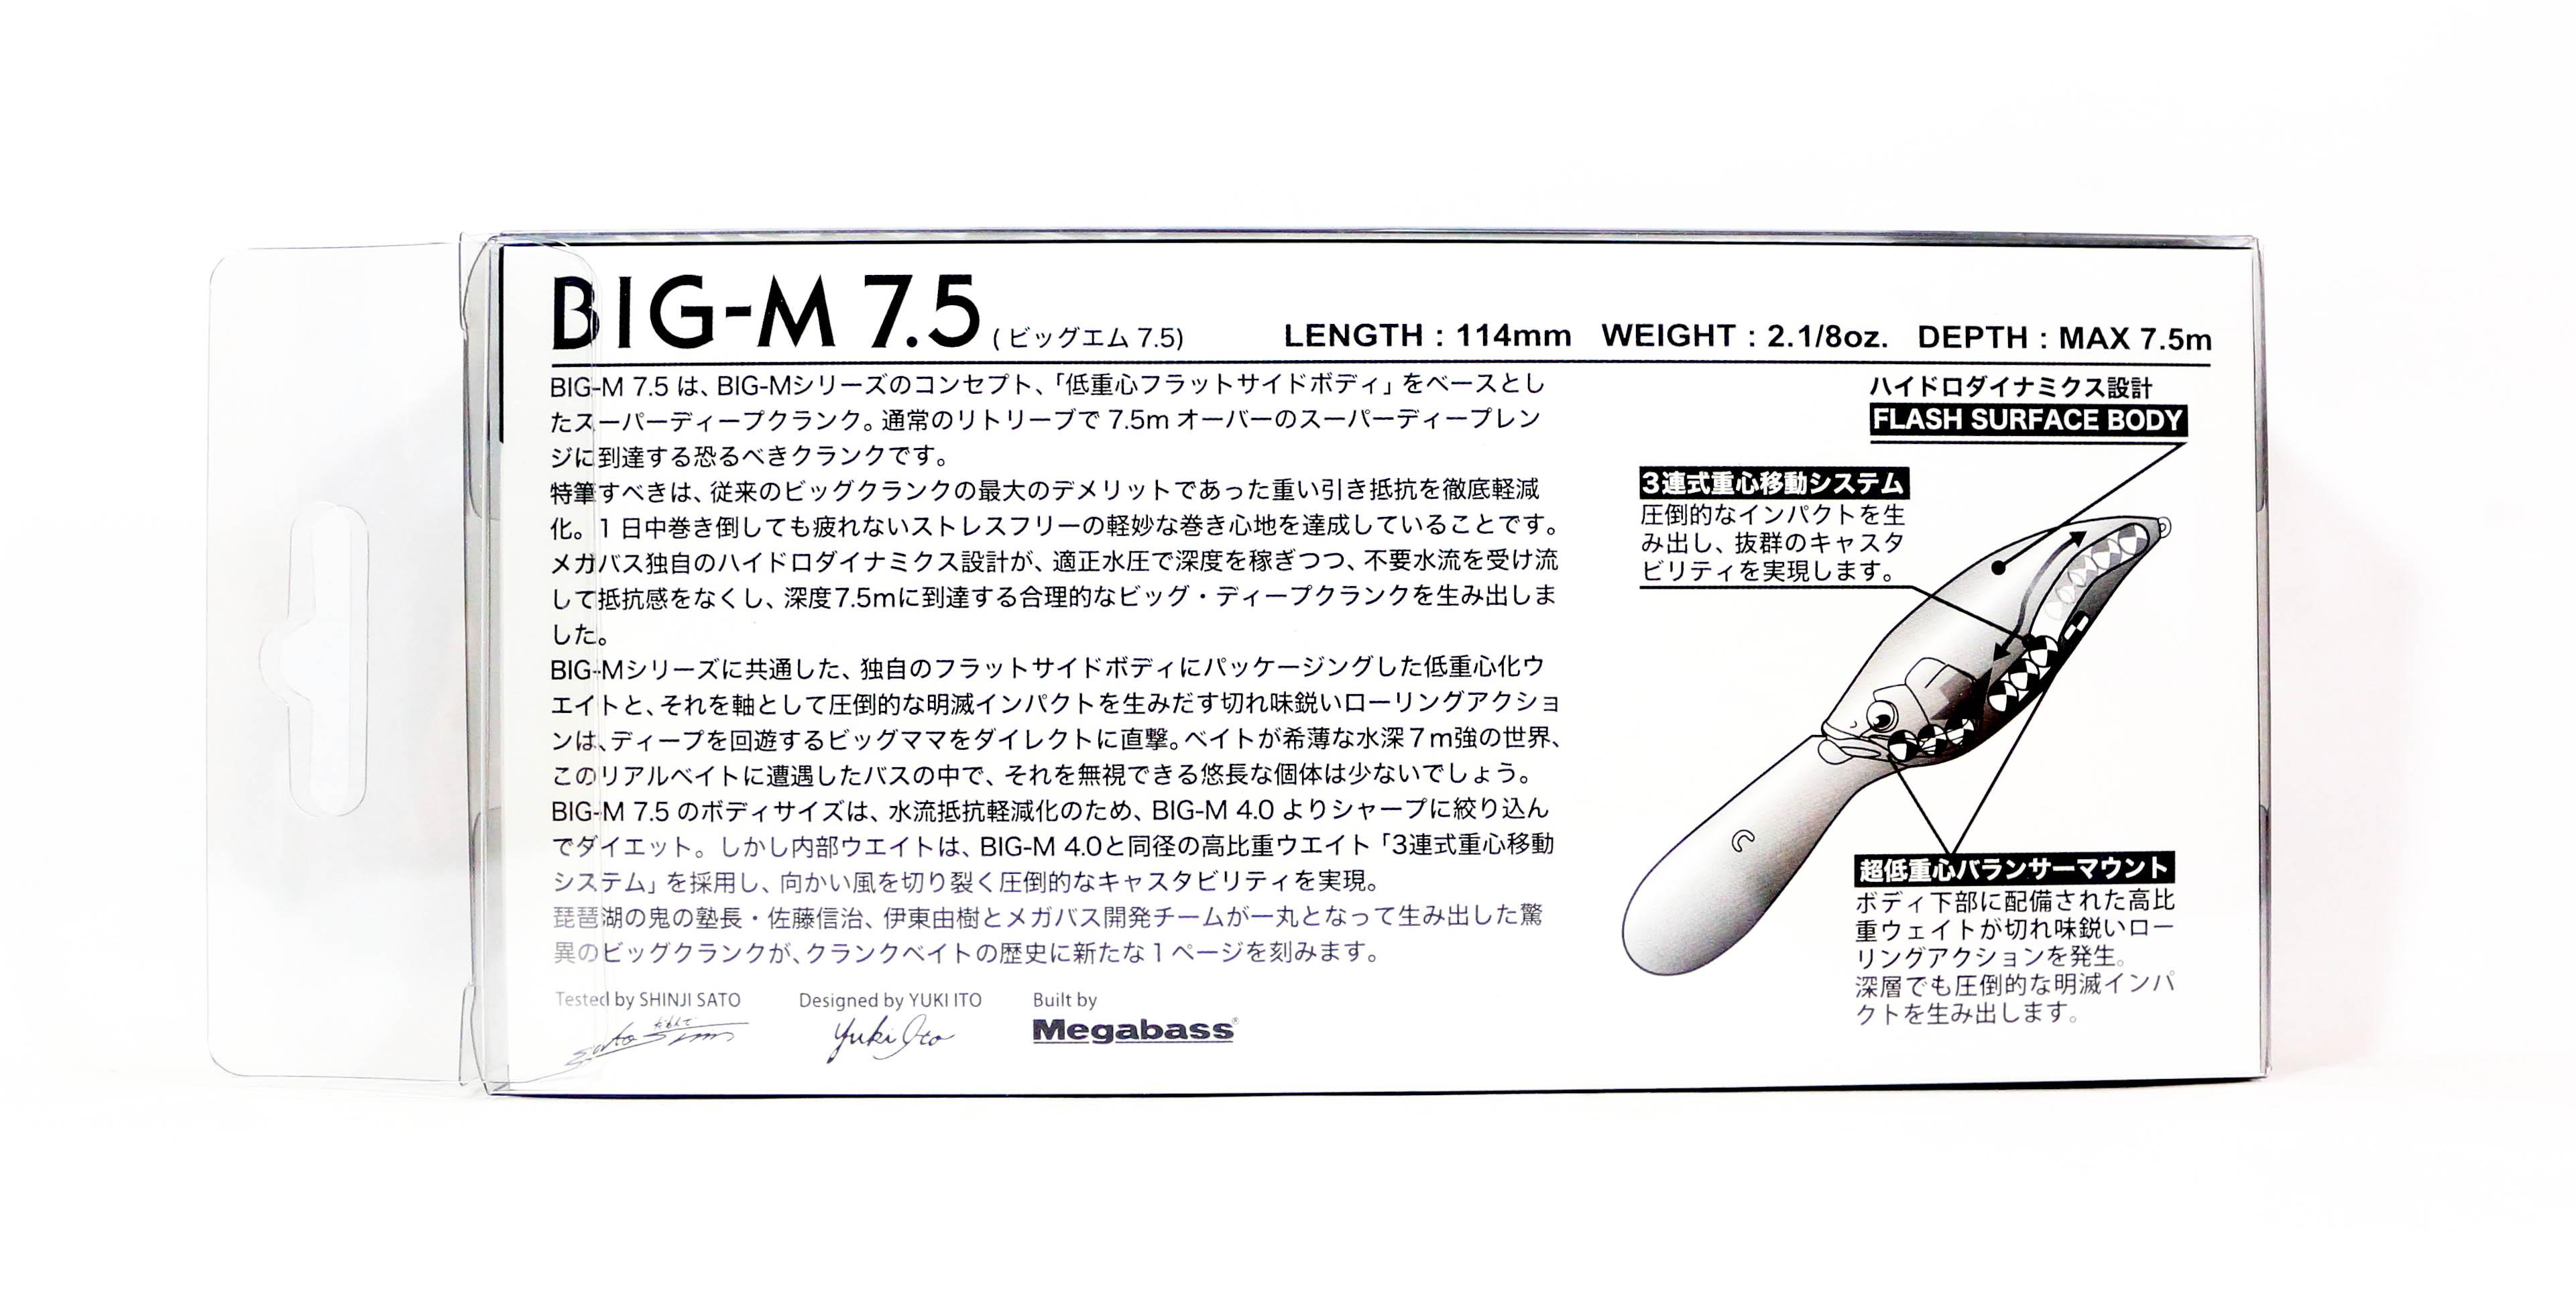 2701 for sale online Megabass Big M 7.5 Giant Crank 114 Mm Floating Lure GG Wild Gill BM